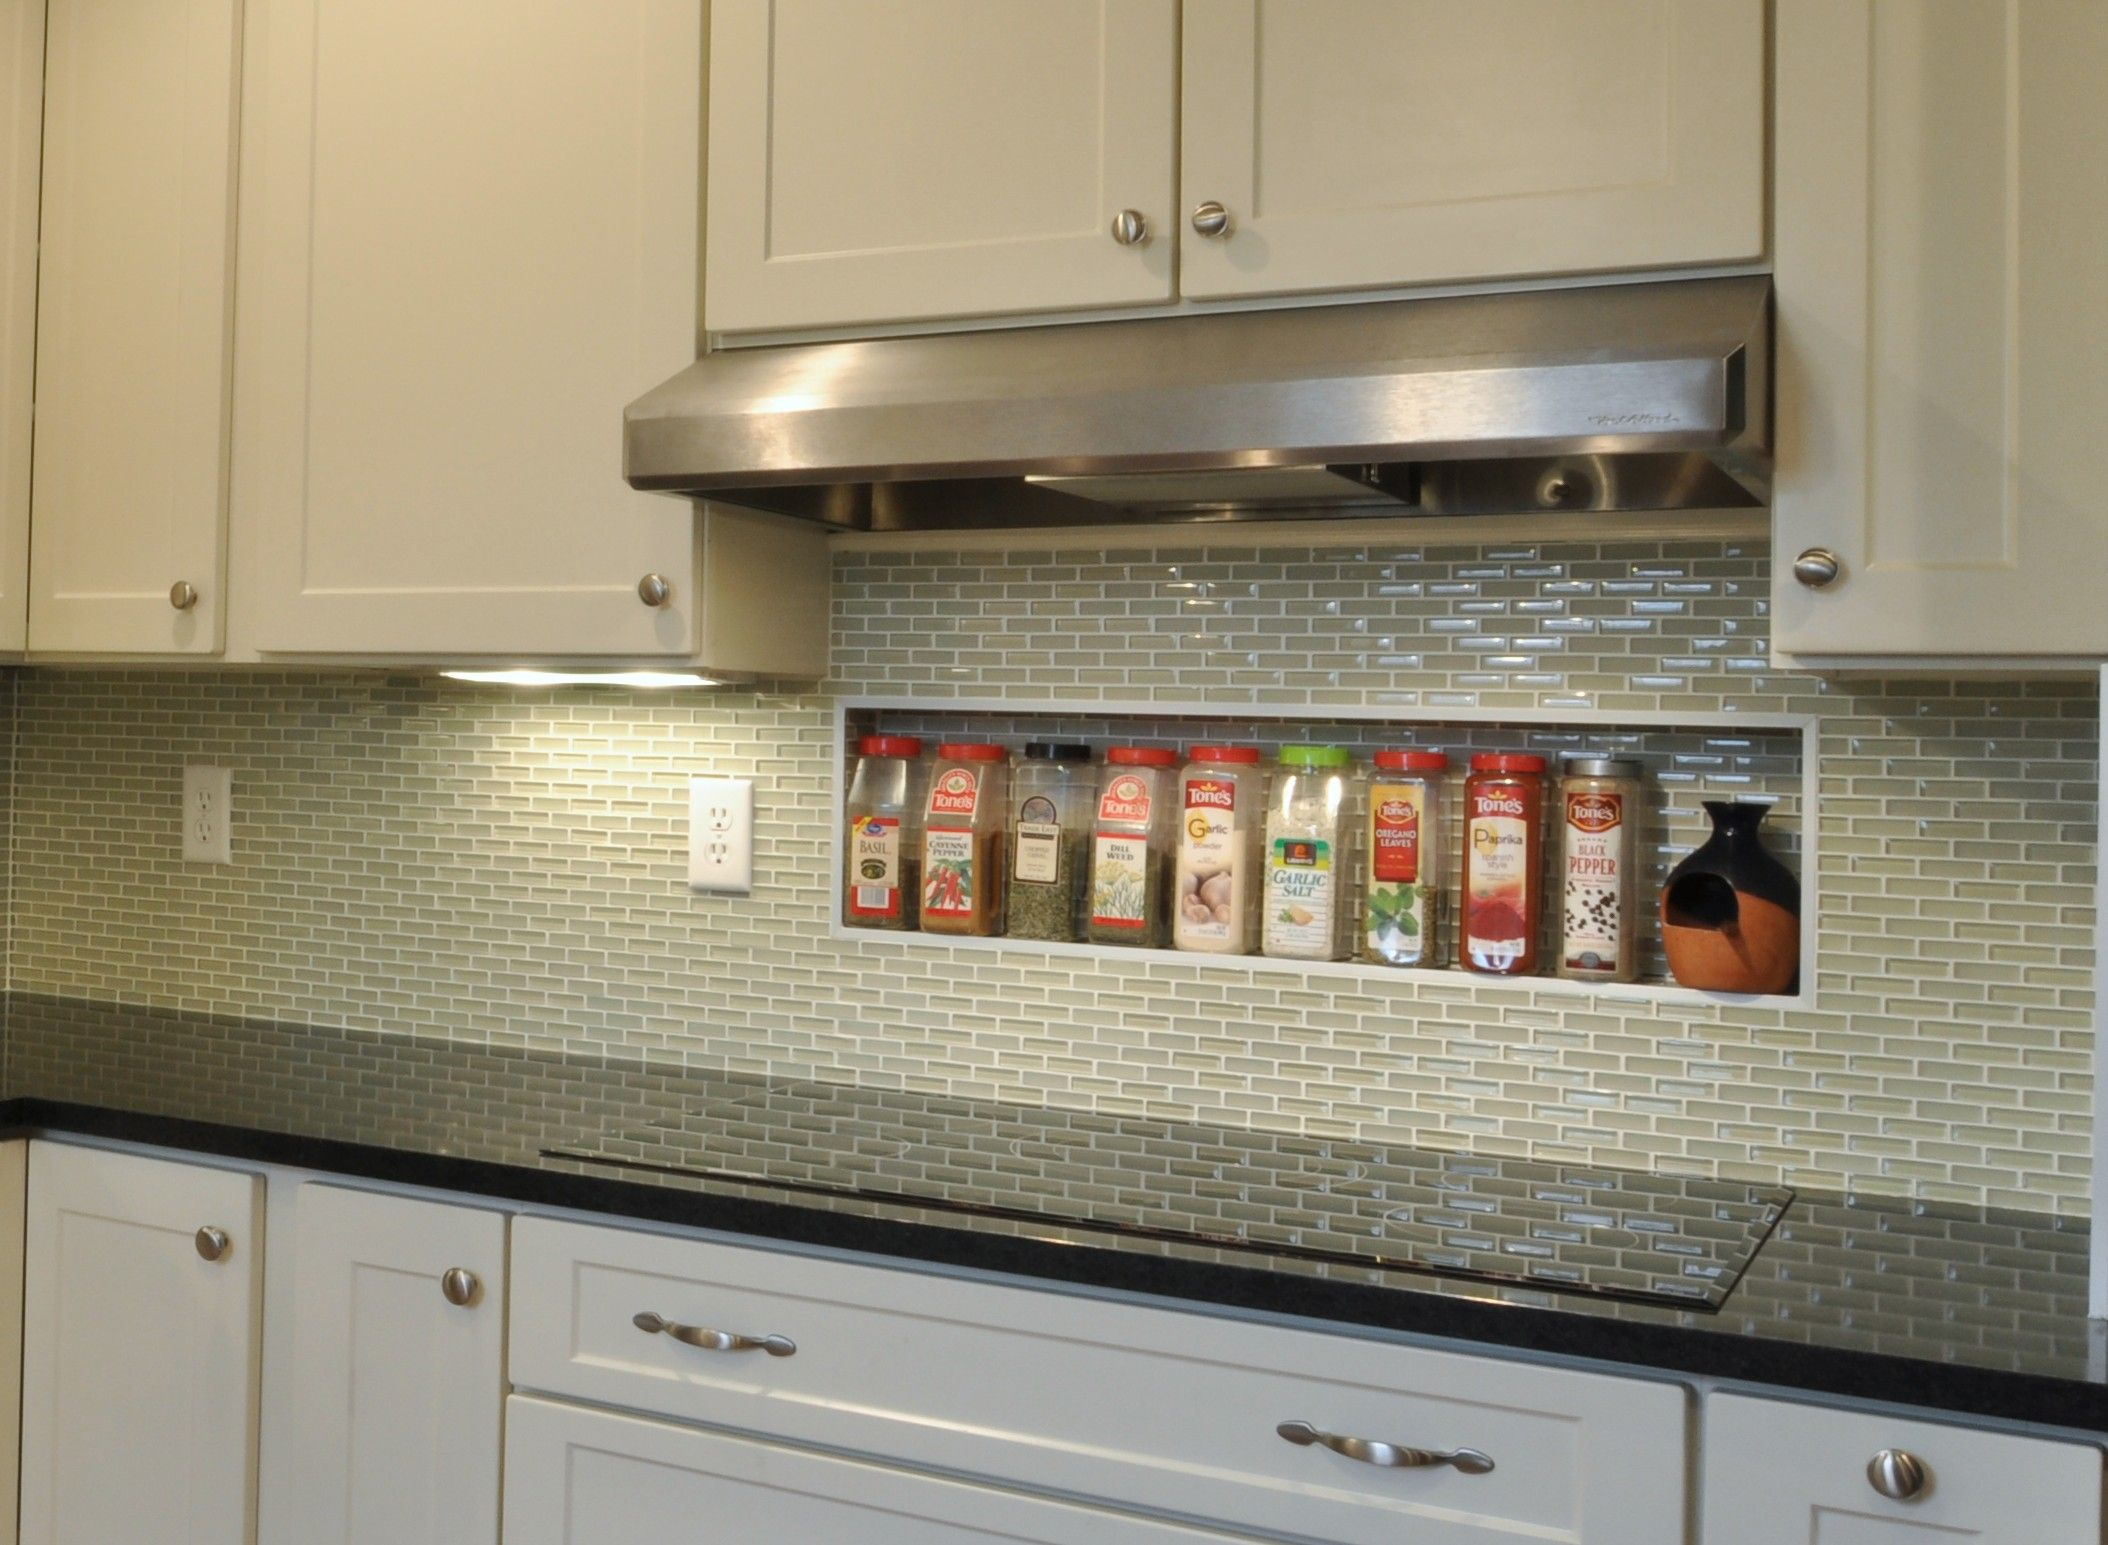 Elegant Decoration, Inexpensive And Luxurious Look Kitchen Backsplash Inspiration  Mosaic Tile Ideas ~ Many Ways To Find Lovely Inexpensive Backsplash Options  For ...